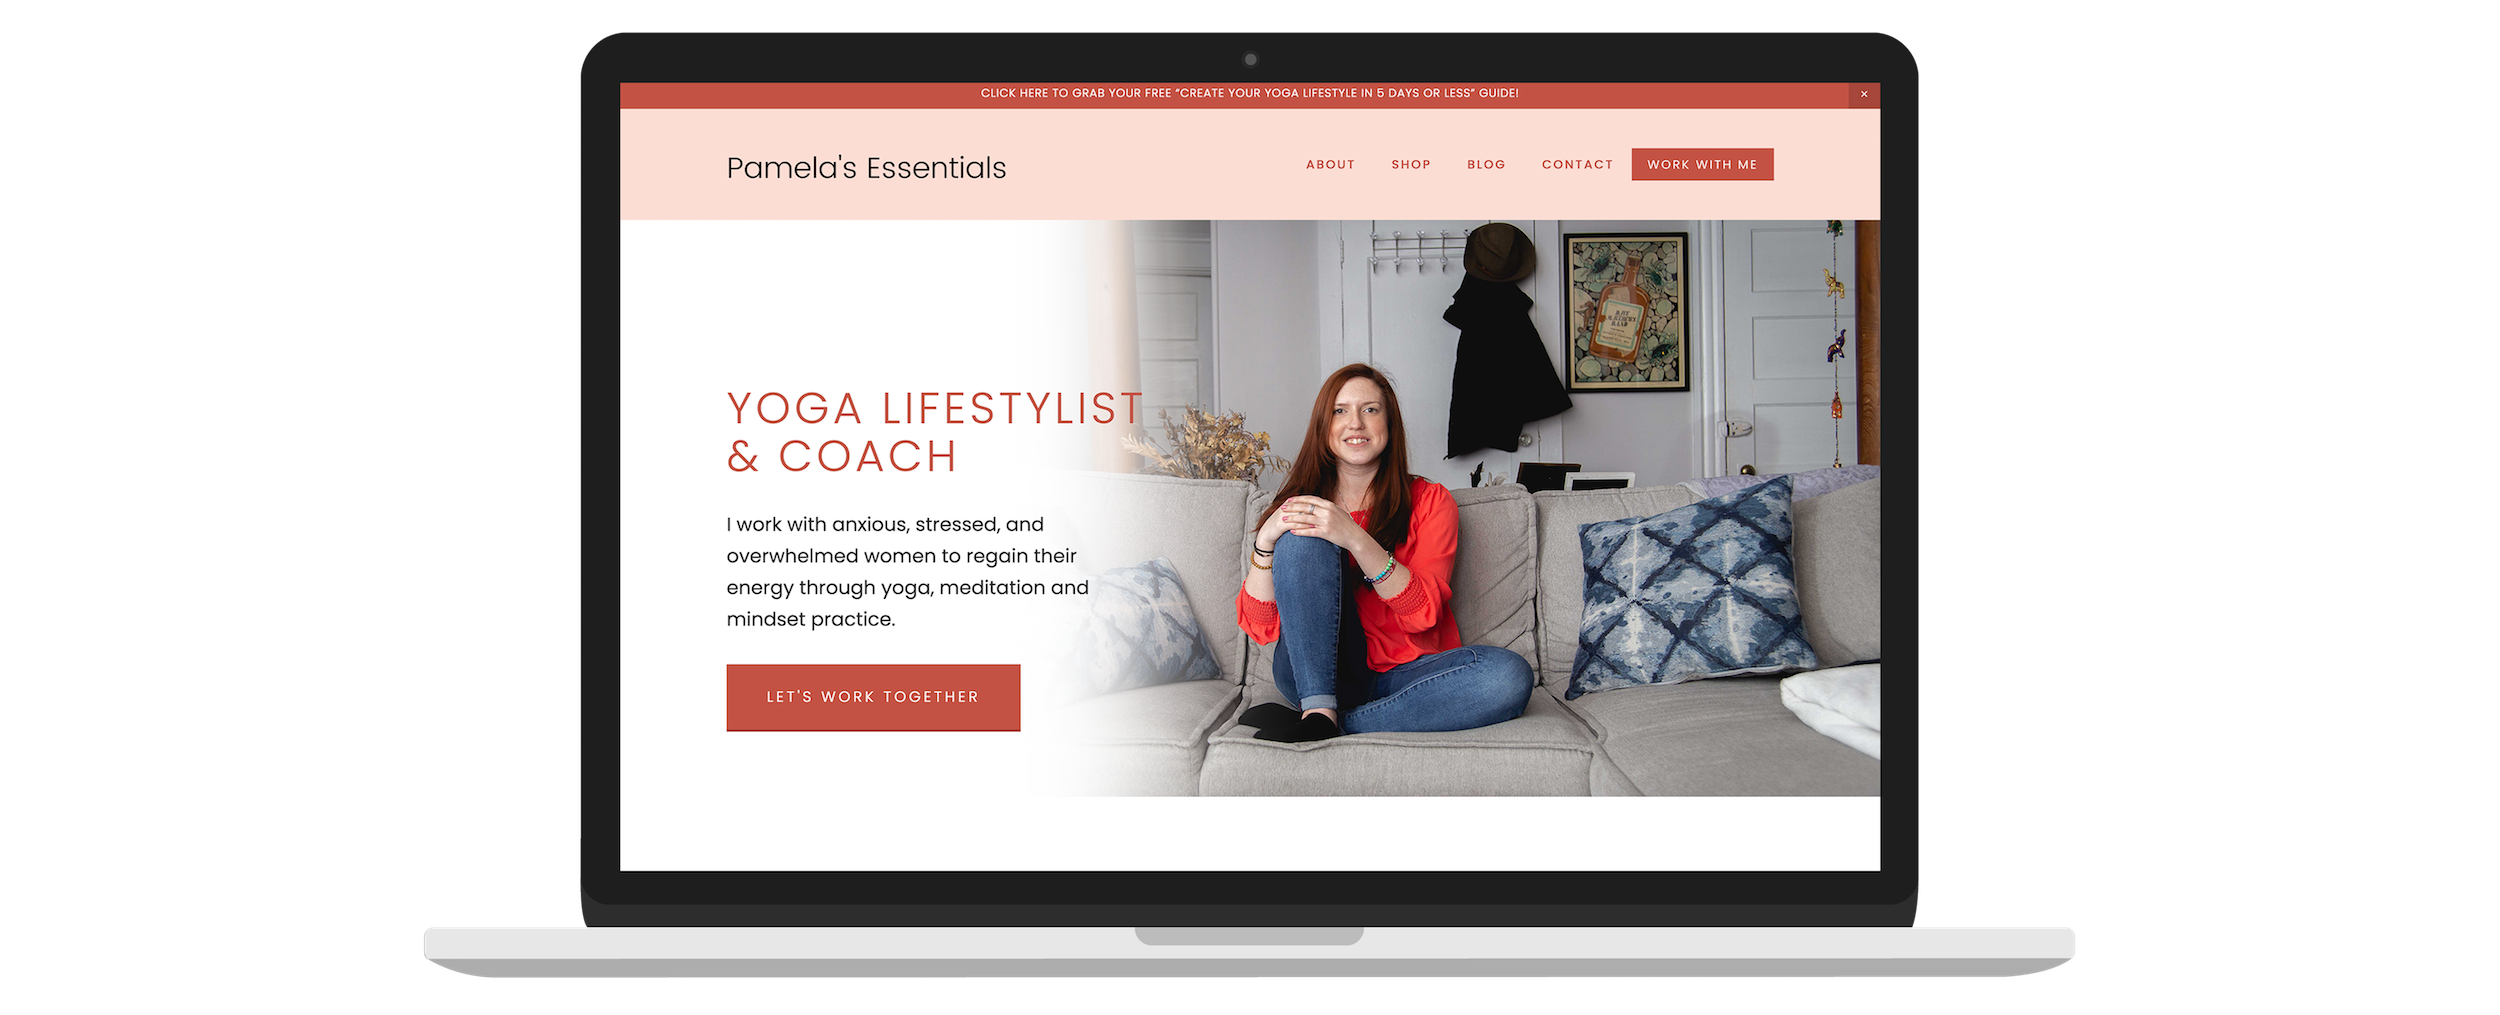 pamela feminine squarespace website design.png